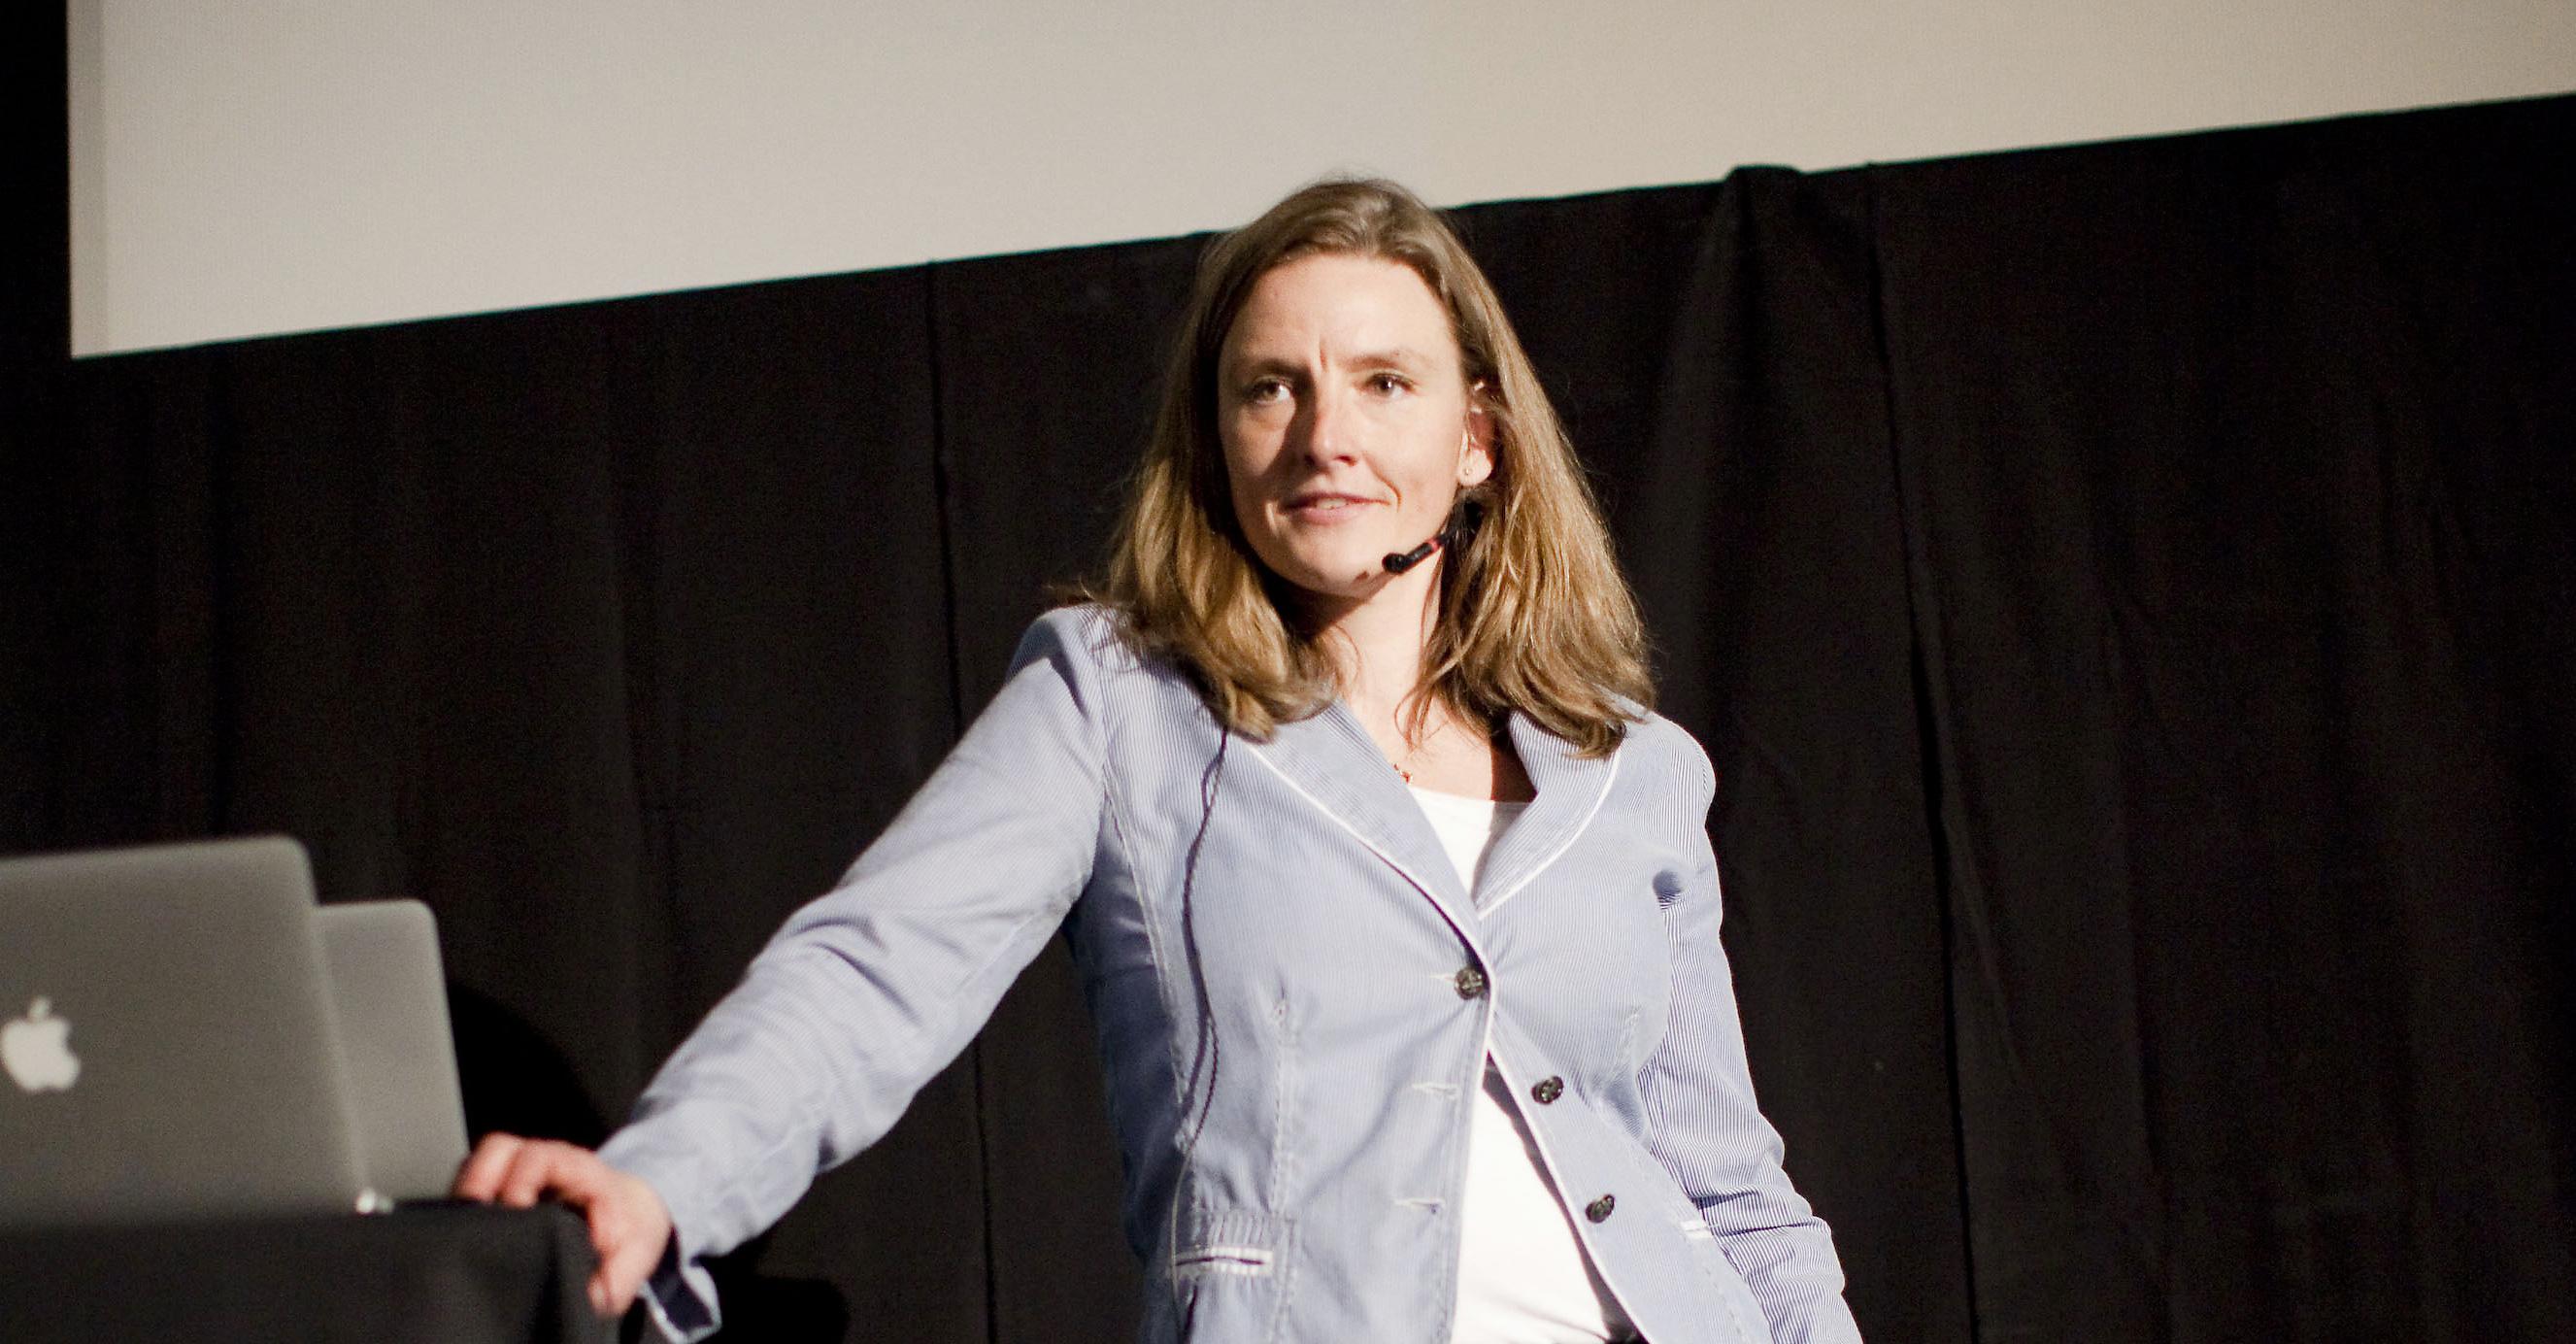 Therese Sjölundh